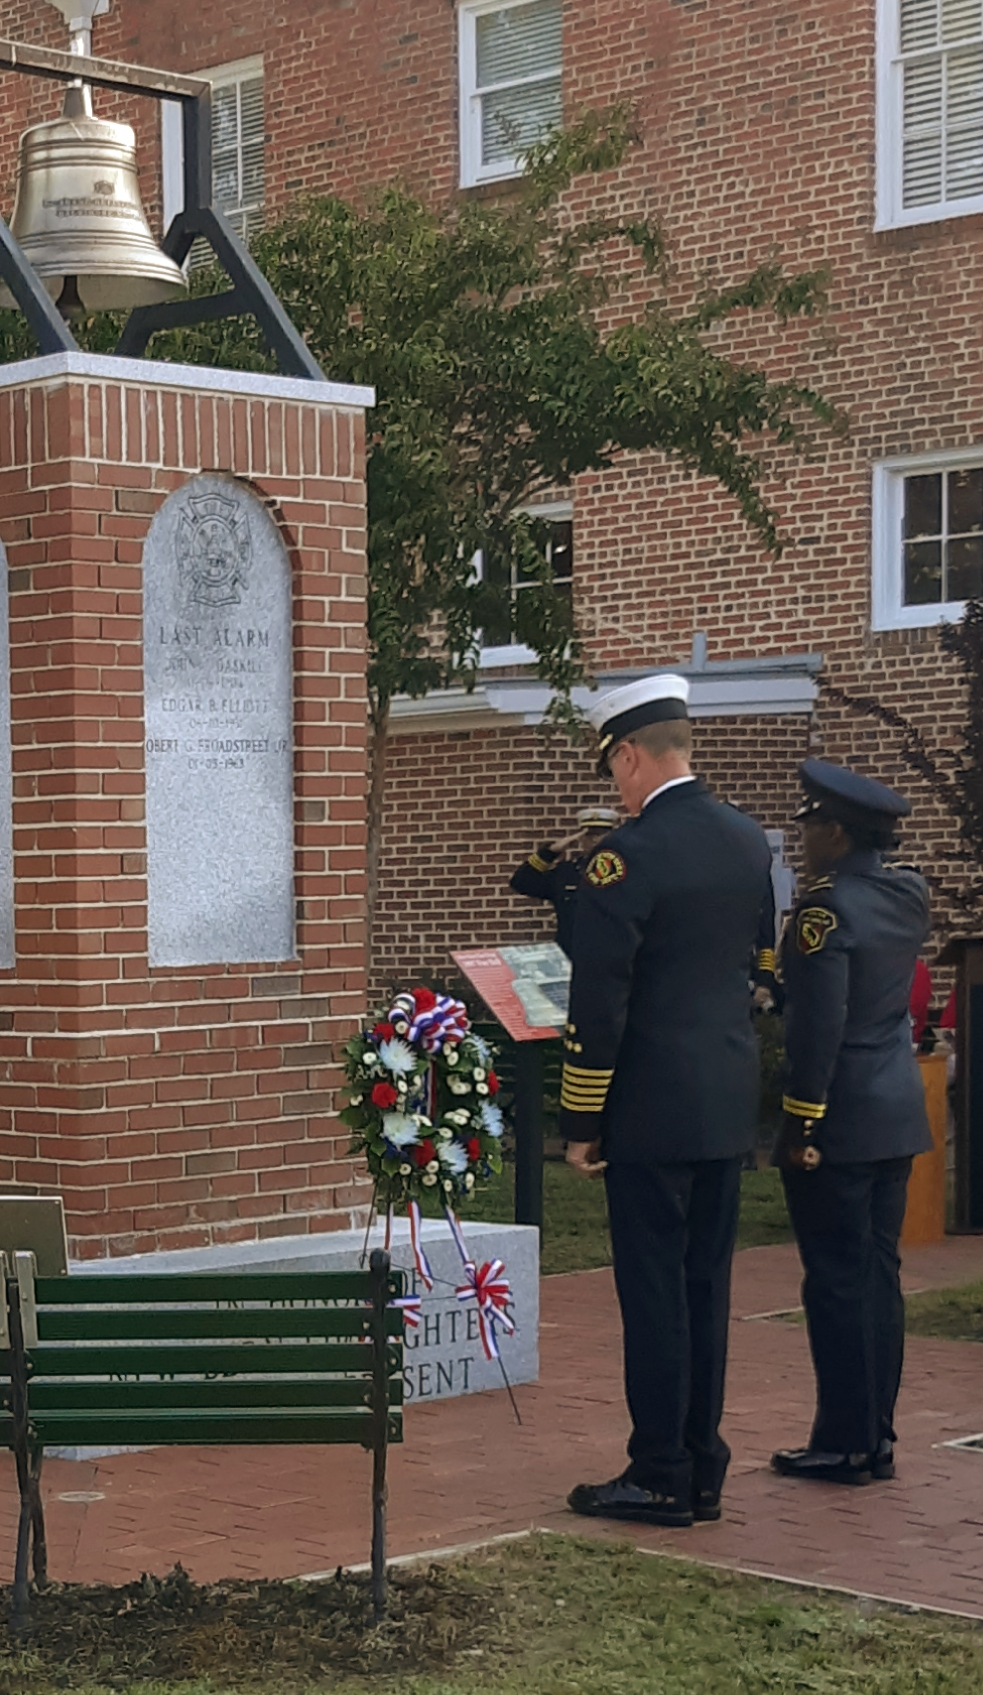 20th Anniversary 9/11 Memorial Ceremony